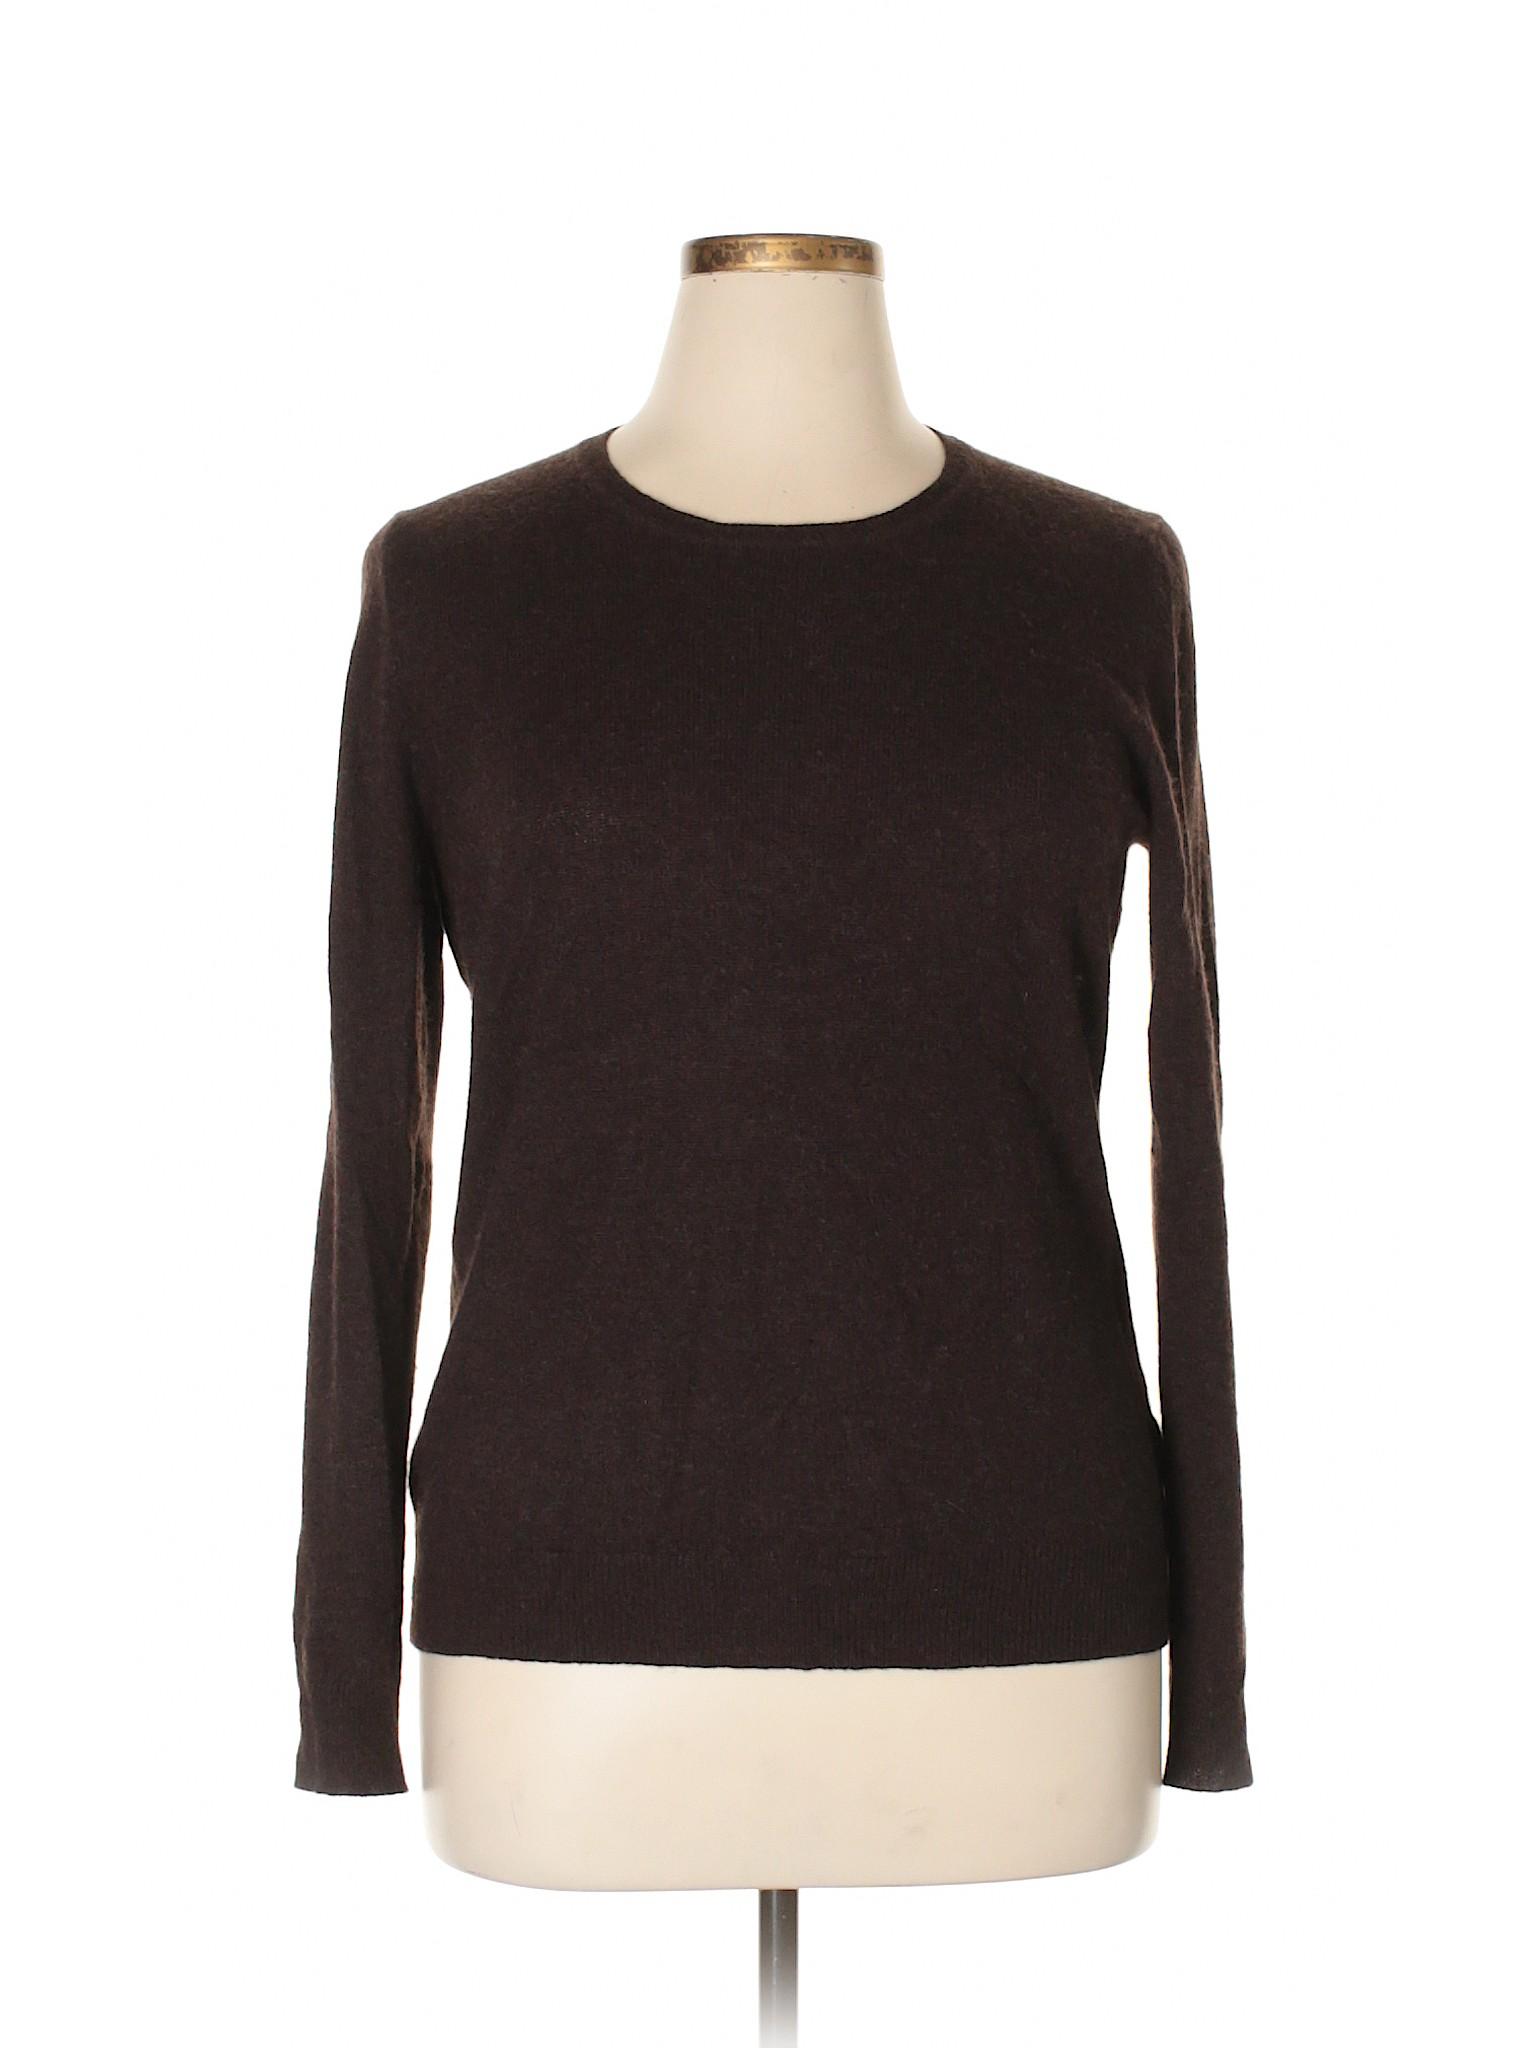 Boutique Taylor Pullover amp; Sweater Cashmere Lord winter qratwBRqx